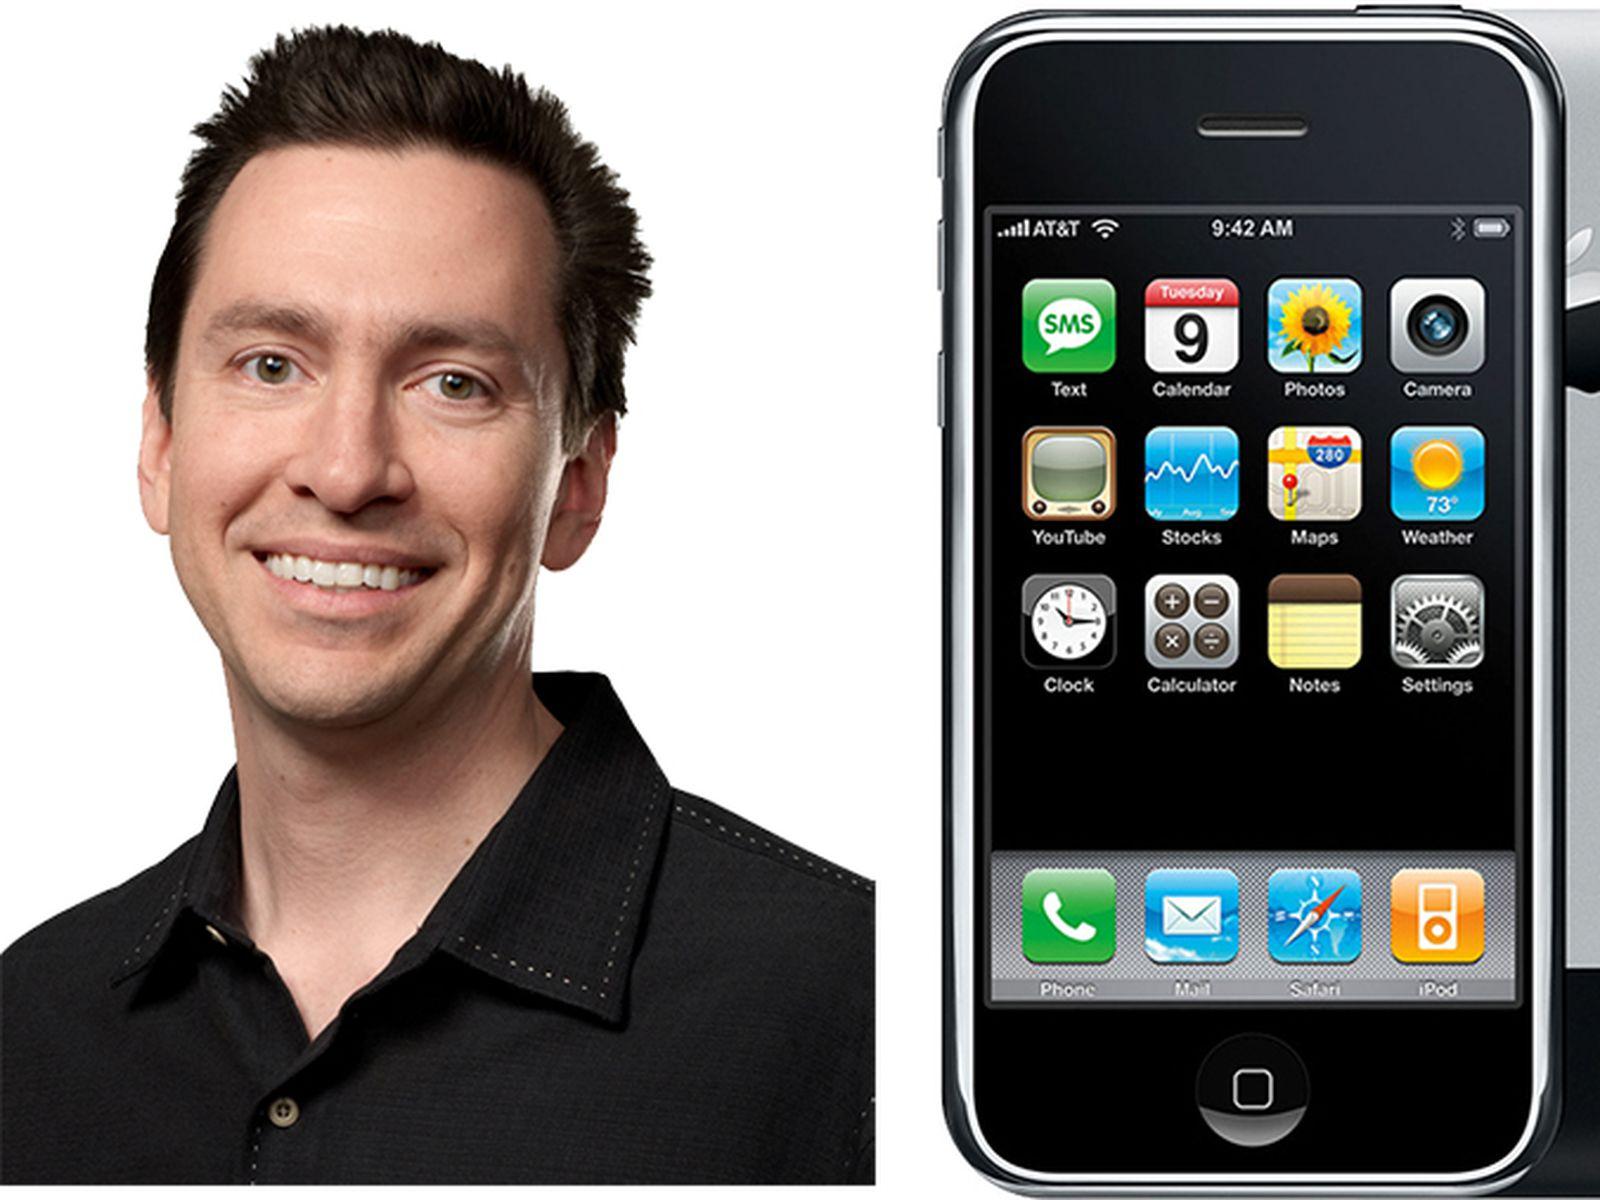 scott forstall ios اپیک گیمز میخواهد مدیر سابق و اخراج شده iOS را برای شهادت علیه اپل پیدا کند اخبار IT